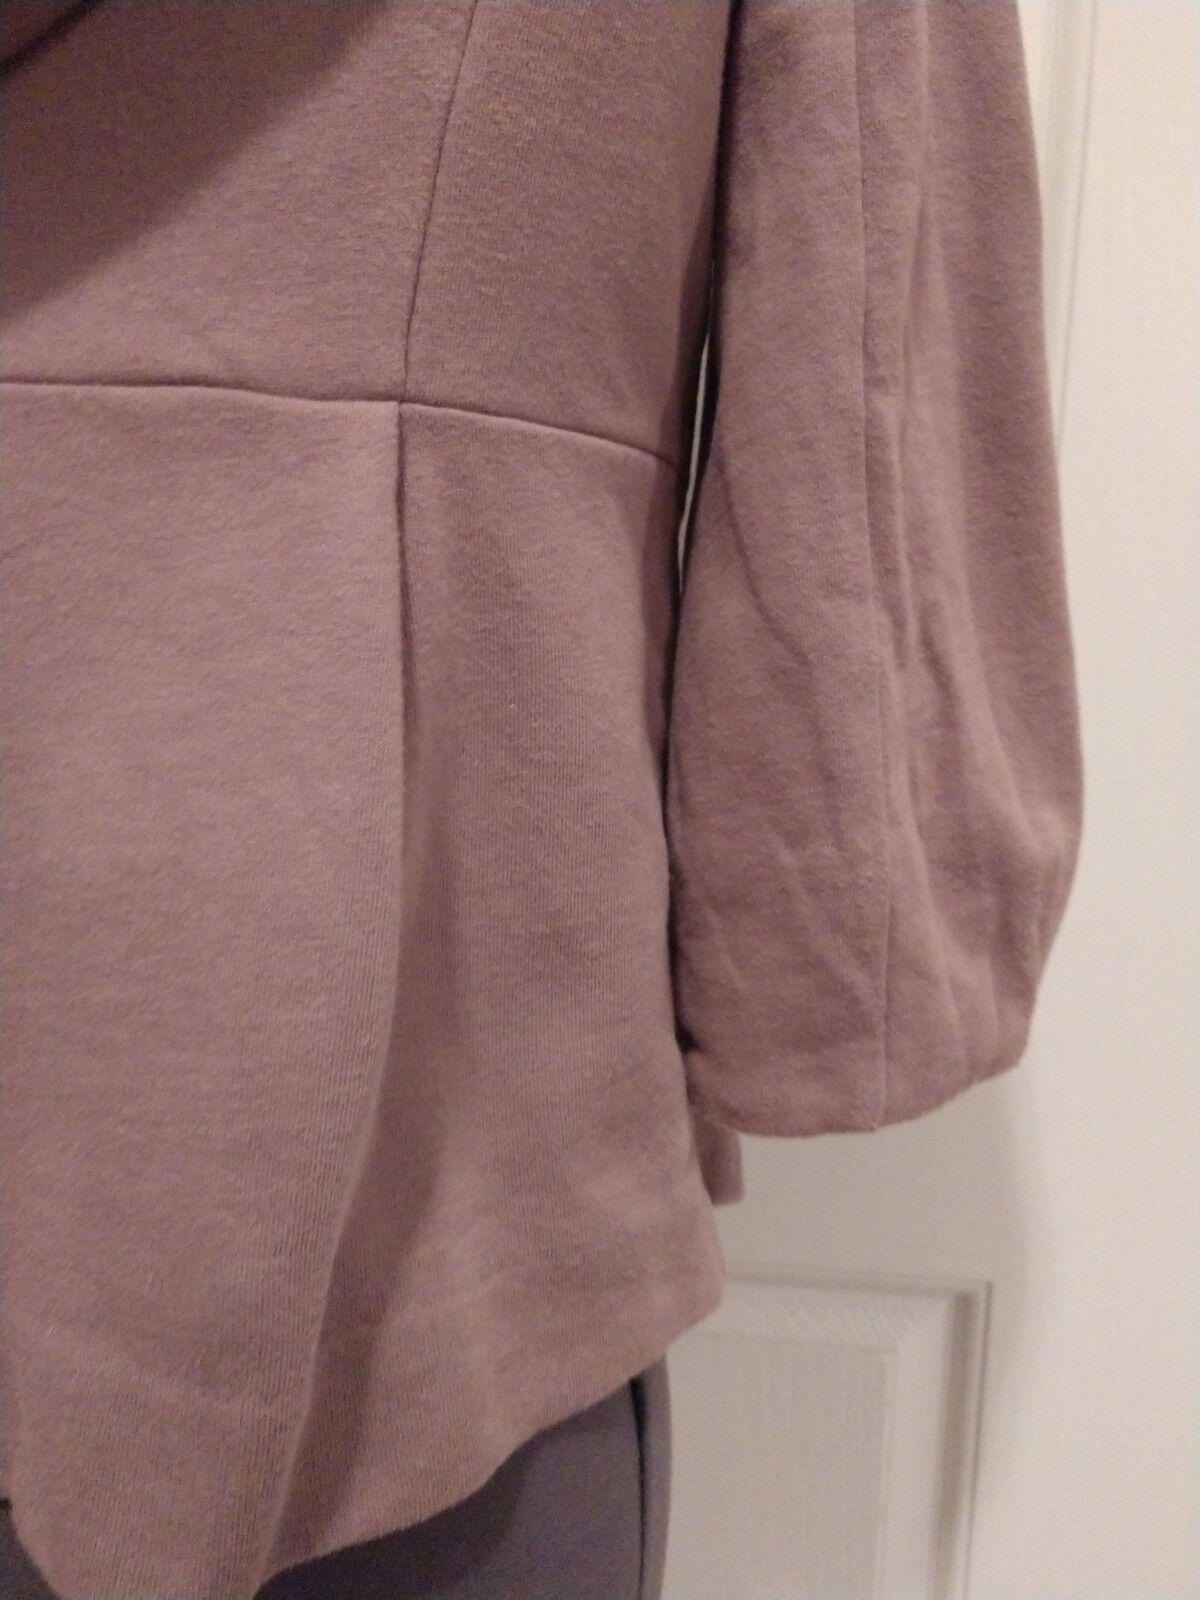 Anthropologie allihop Blazer Blazer Blazer cardigan hoodie 100% cotton 3 4 sleeve peplum sz S 9c4cd8